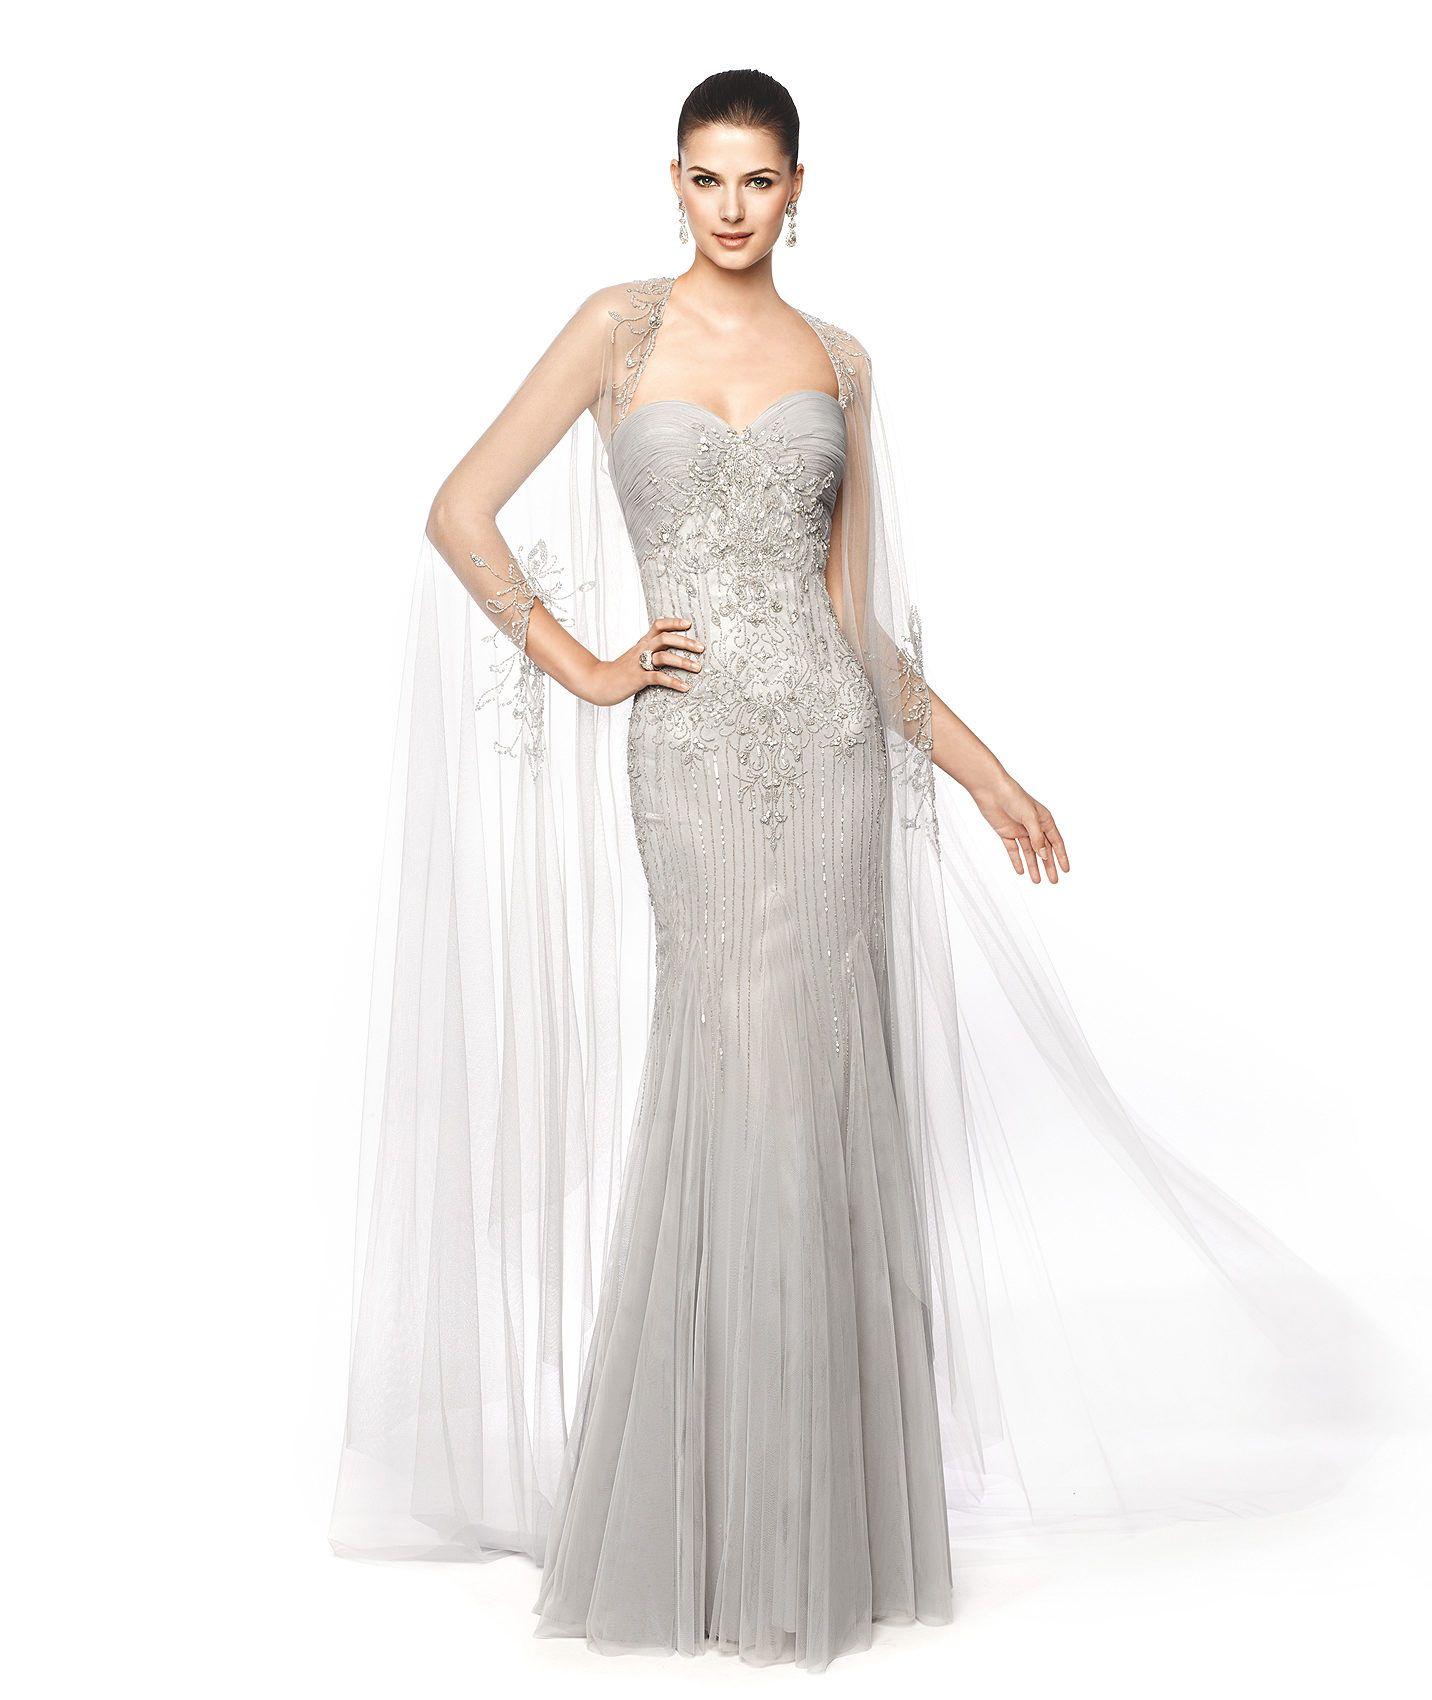 44652c6506 NAYLA - Vestido de fiesta con capa de tul. Pronovias 2015 ...